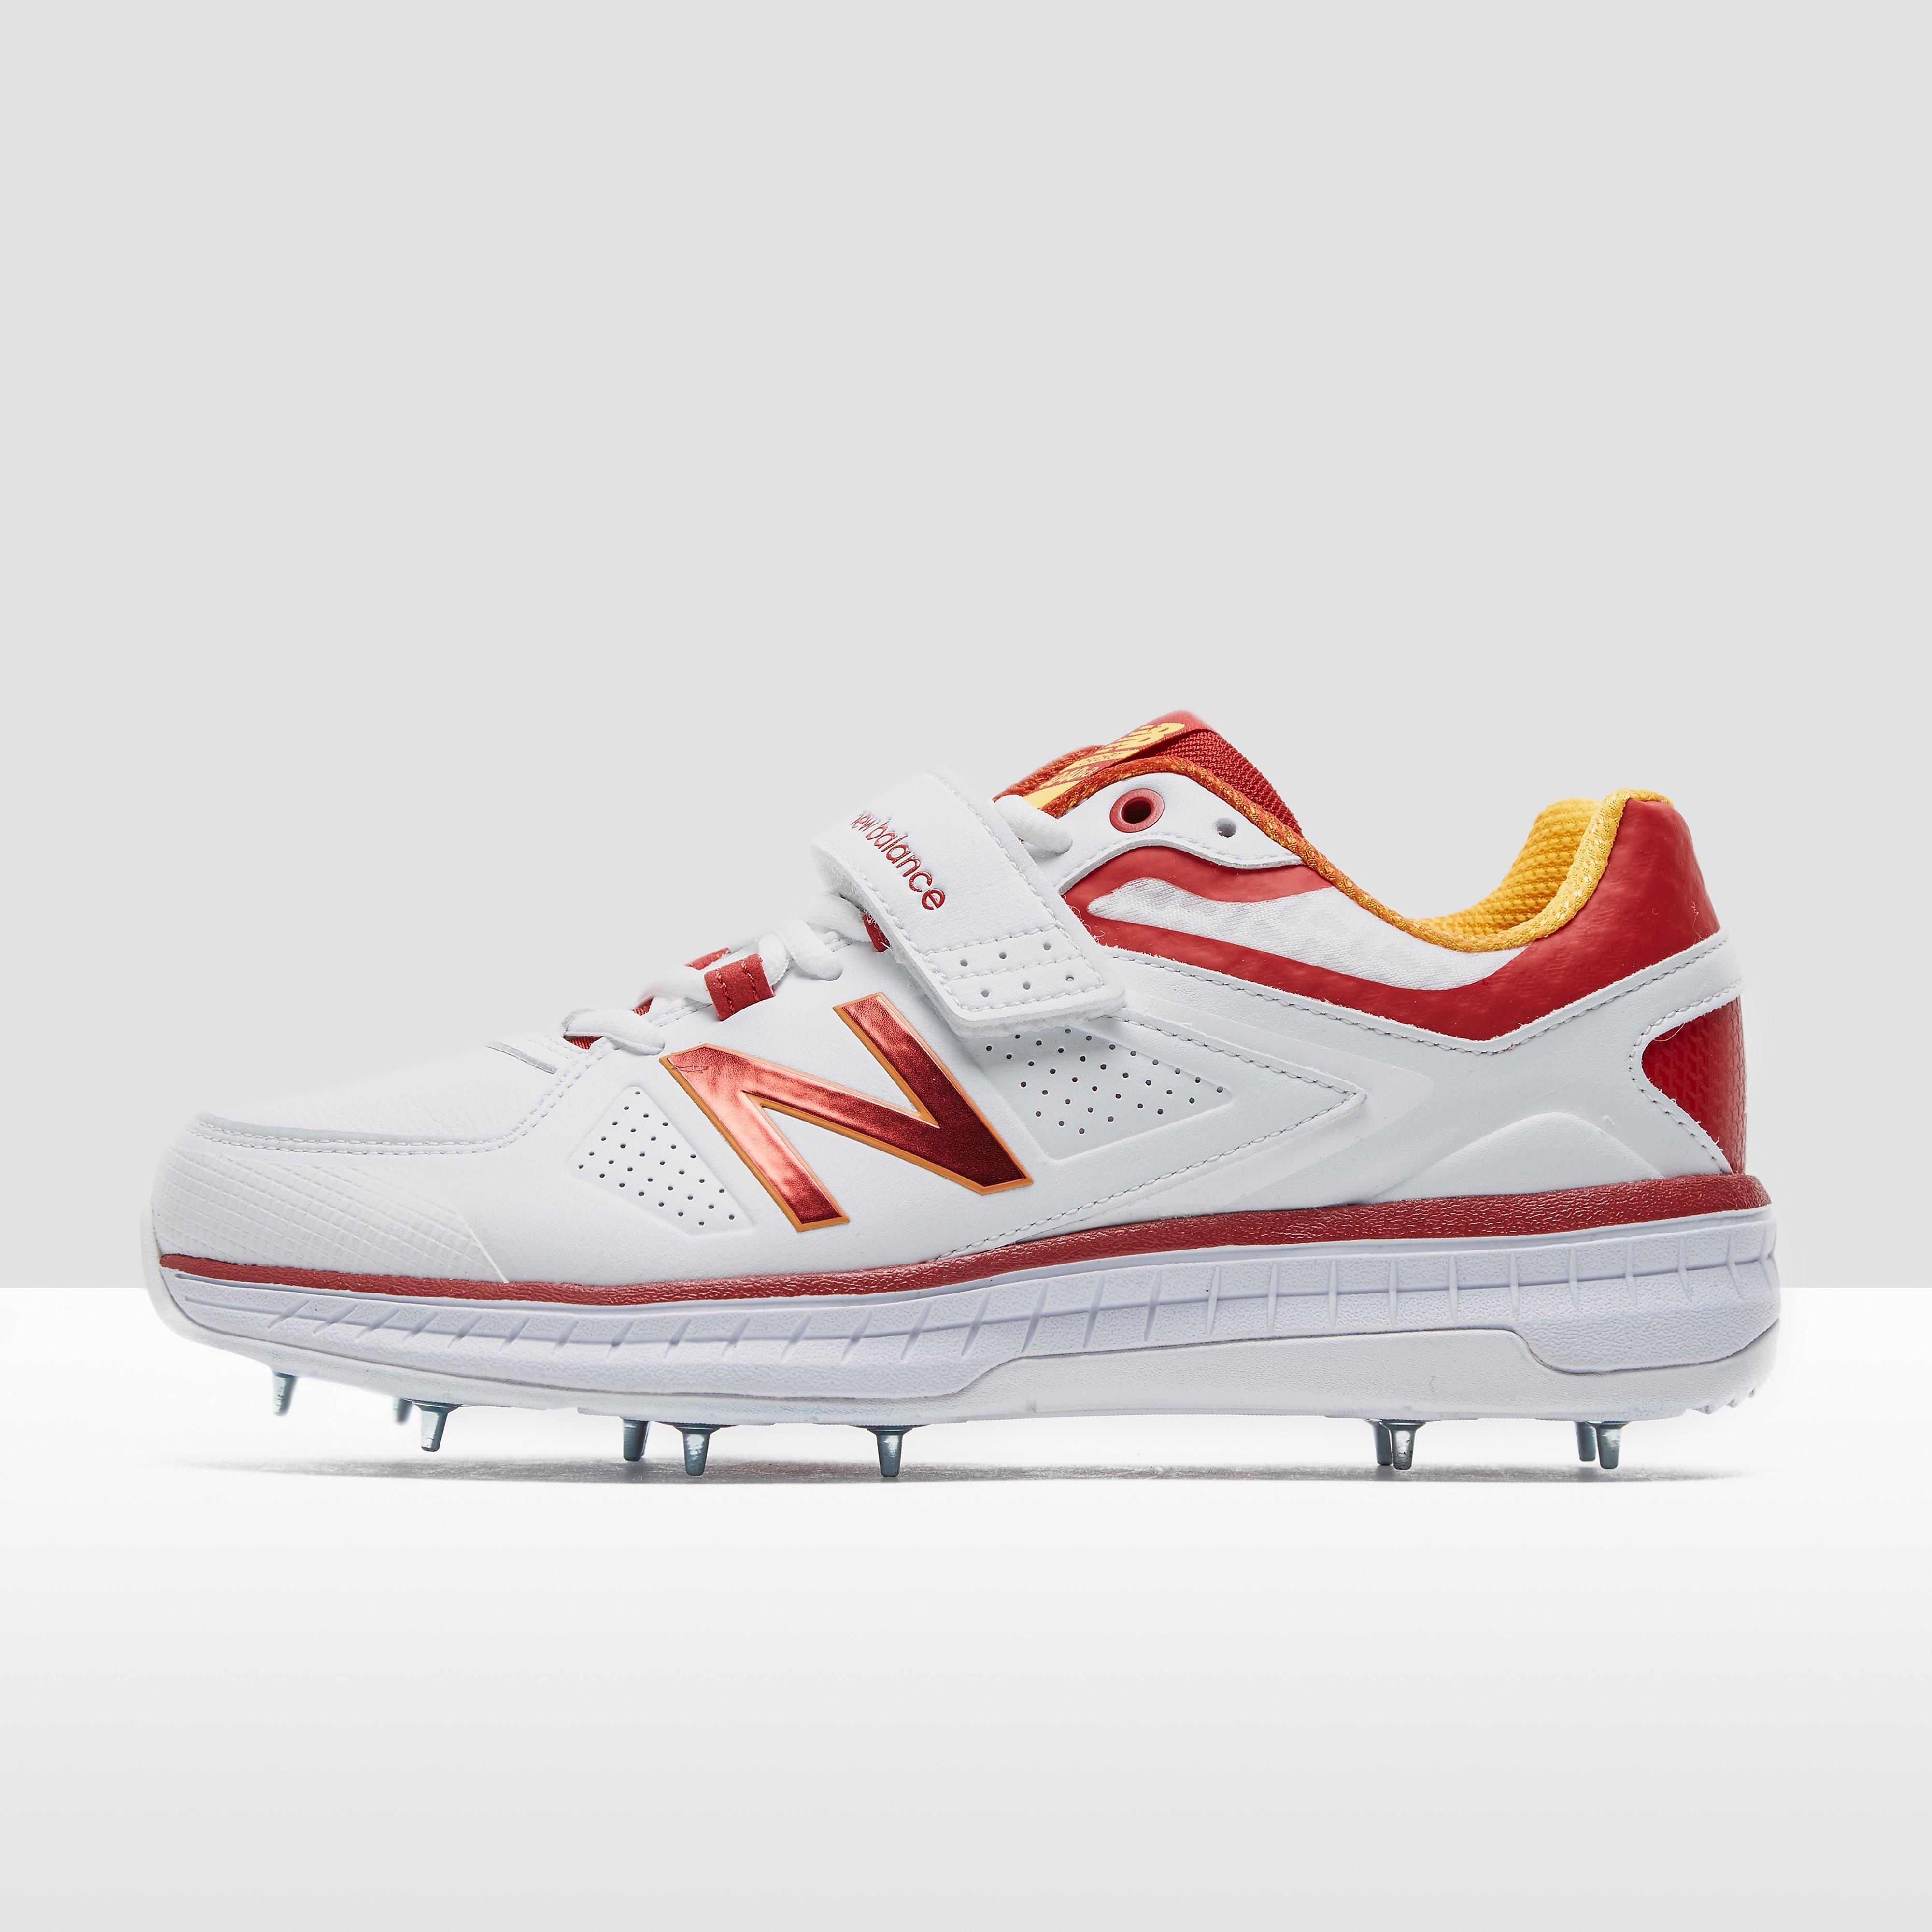 New Balance Men's CK 40/40 R3 Cricket Shoes